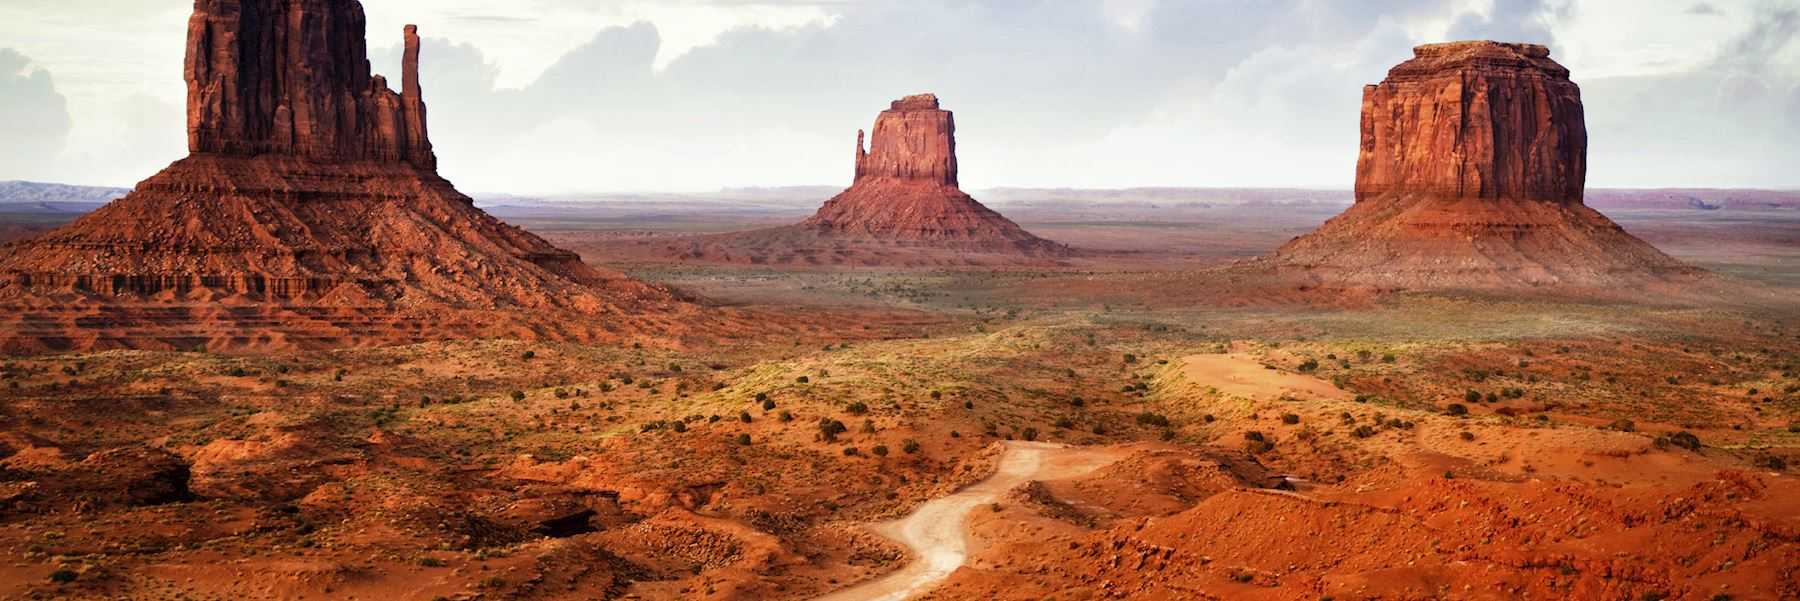 Visit Monument Valley Navajo Tribal Park, USA